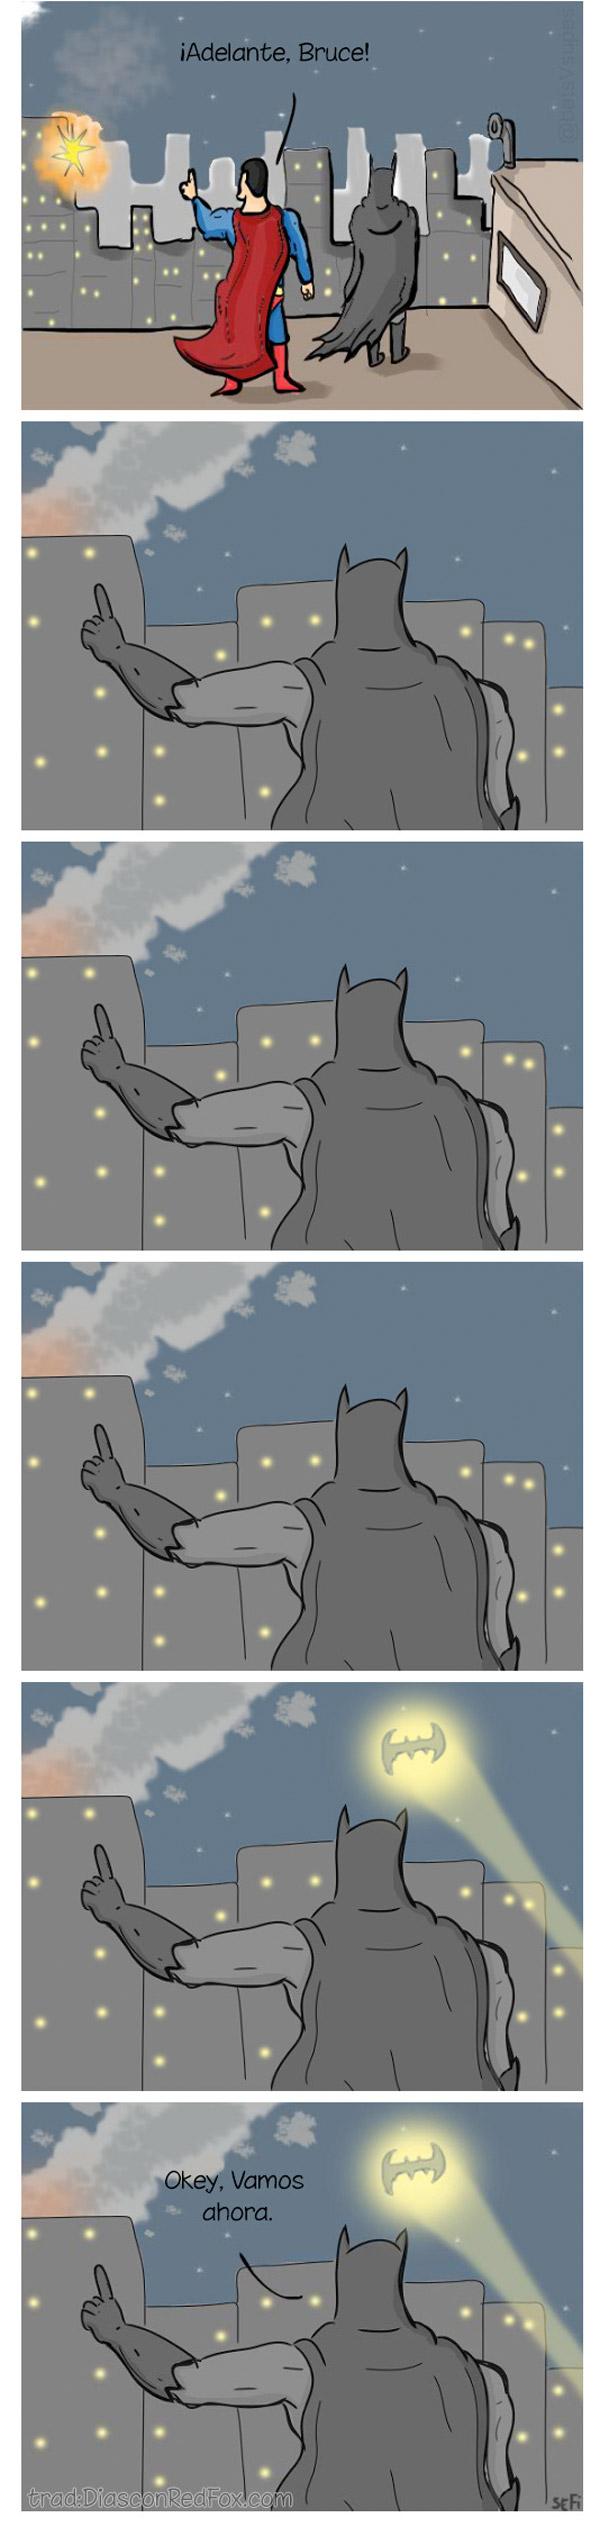 ¡Adelante, Bruce!